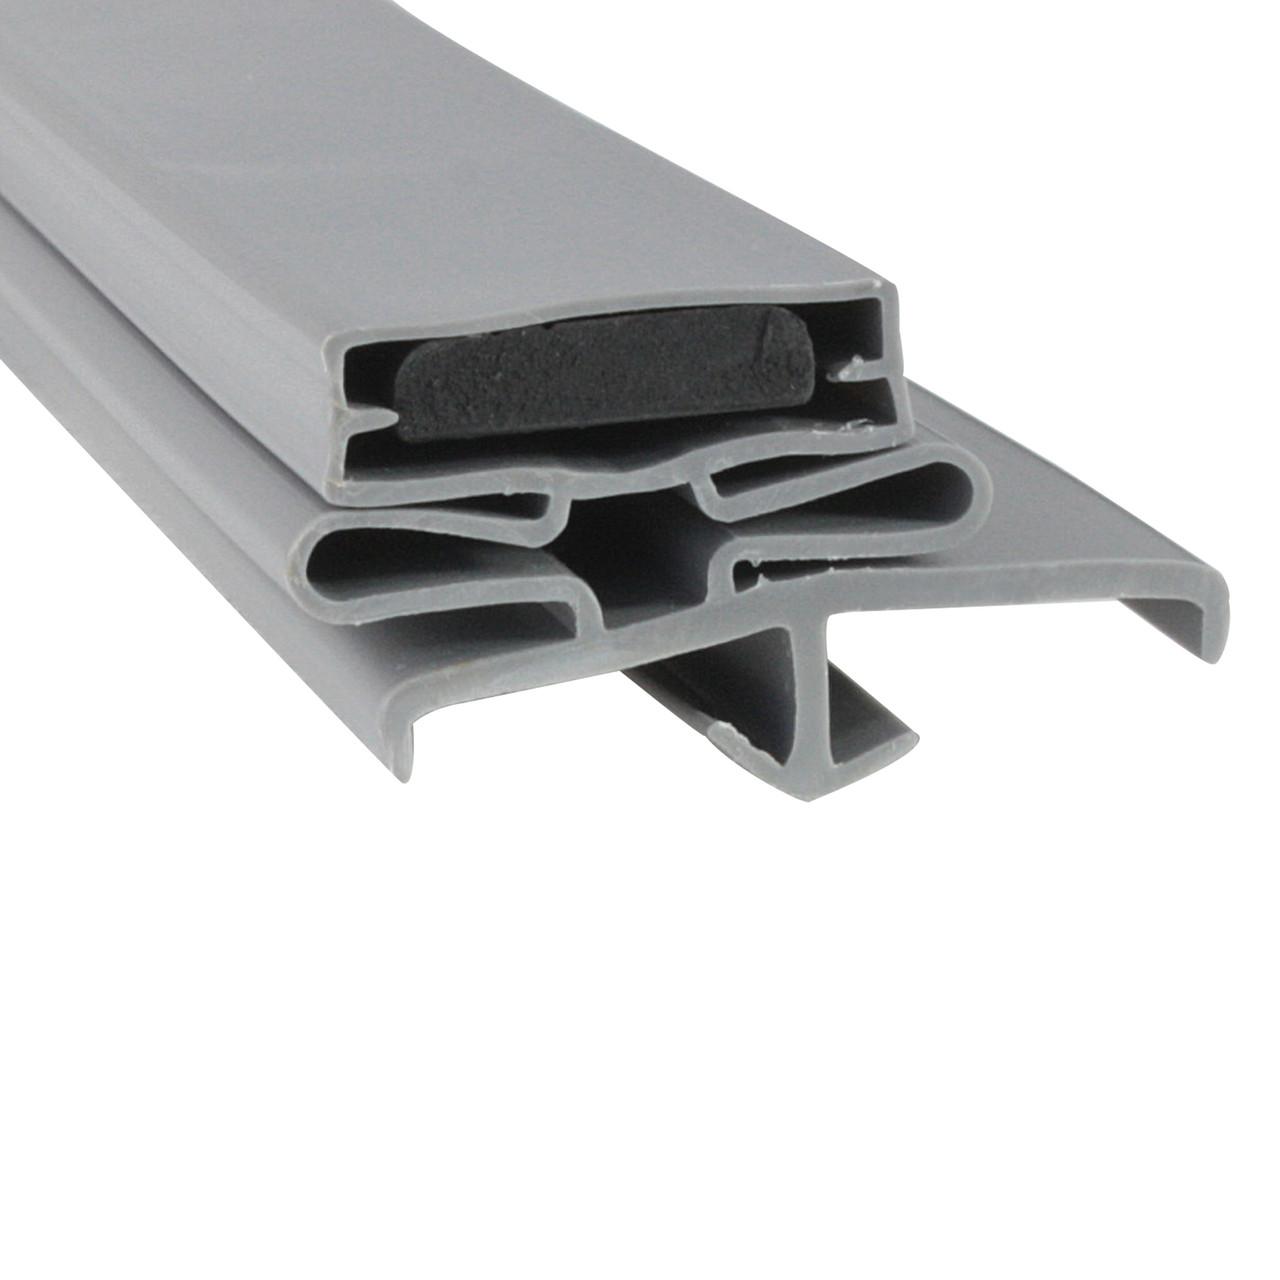 Delfield Door Gasket Profile 168 22 7/8 x 59 1/4 -A2.0881, 170-2295-C